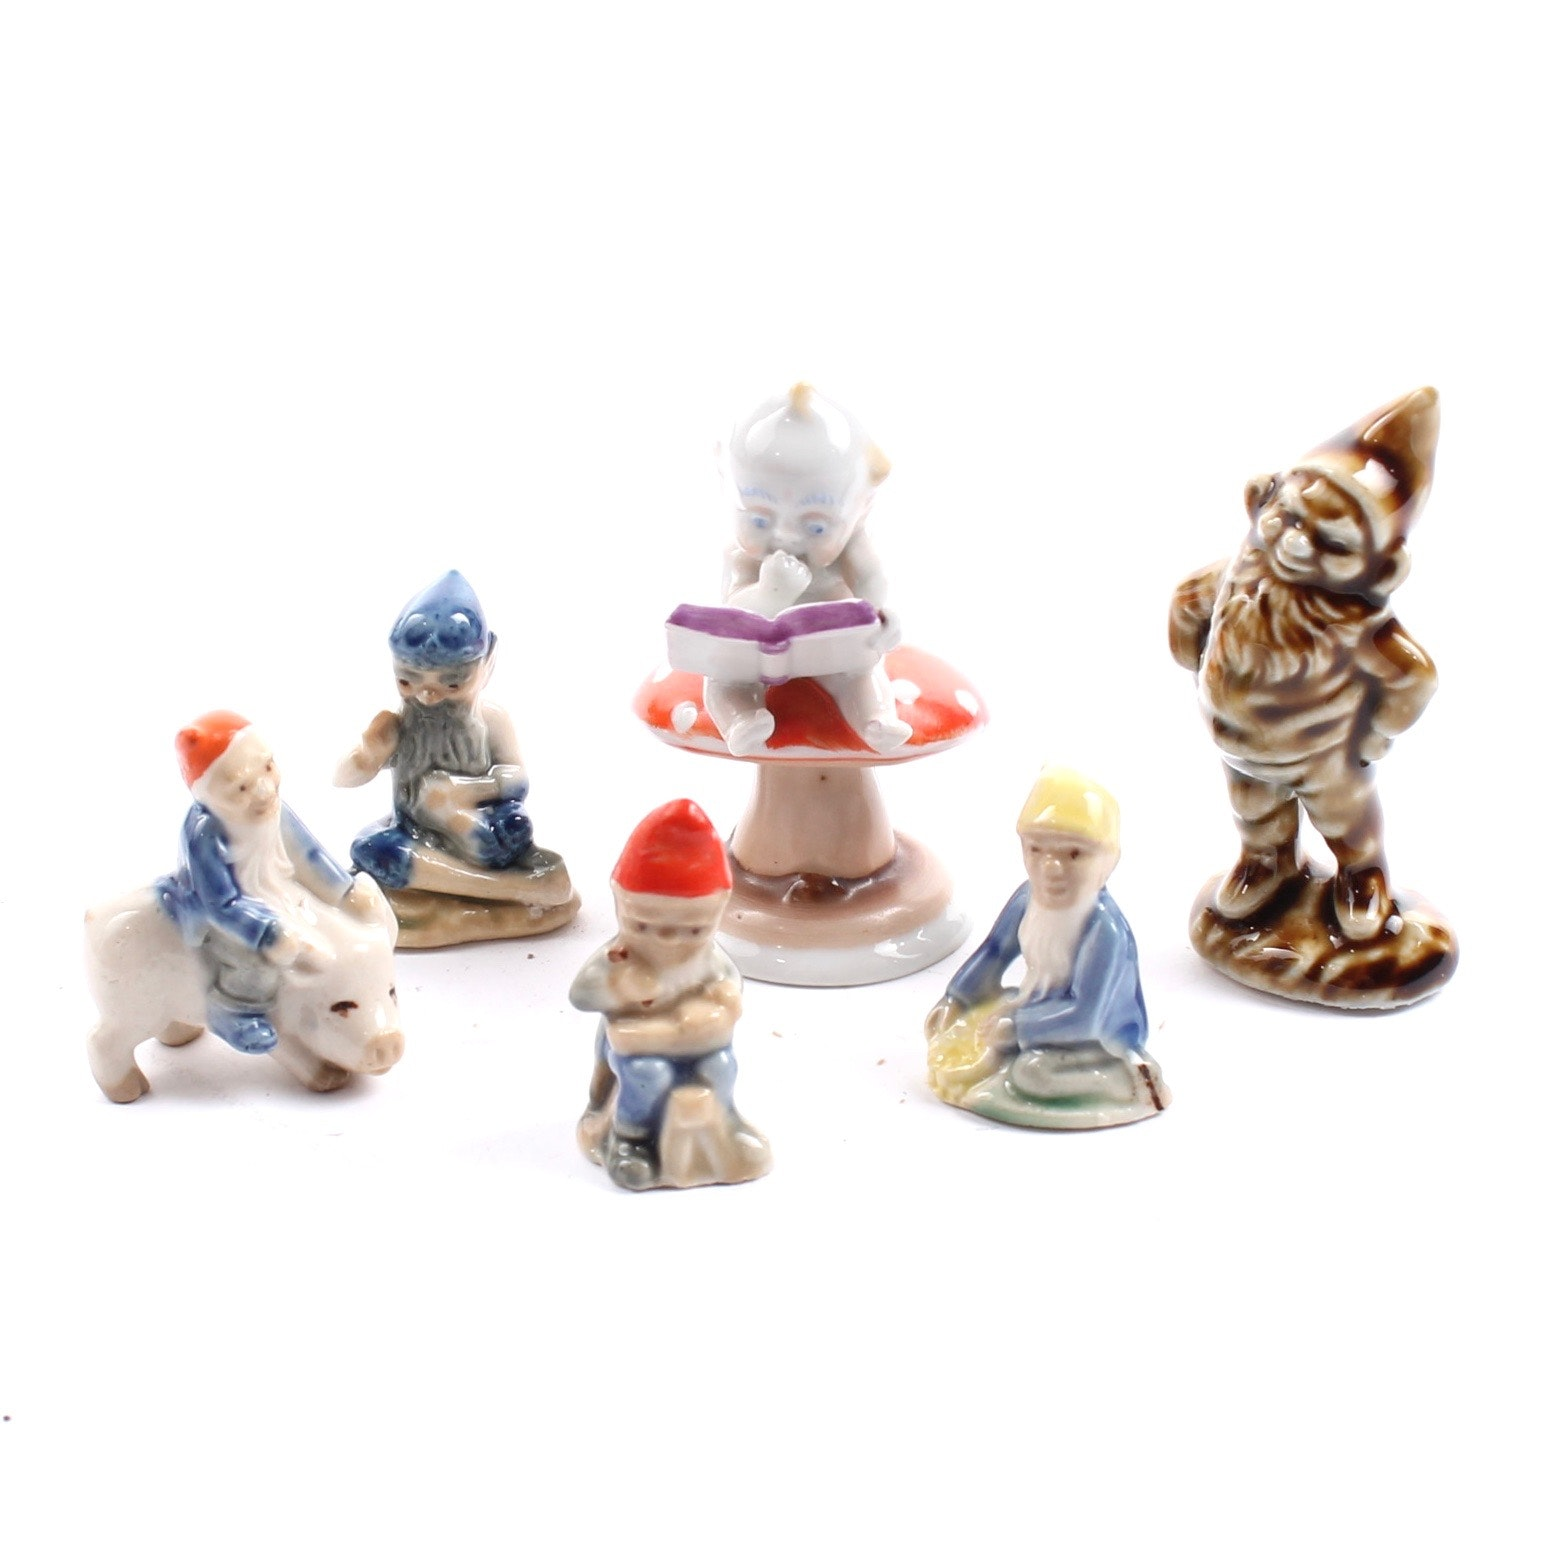 Diminutive Porcelain Dwarfs including Metzler & Ortloff